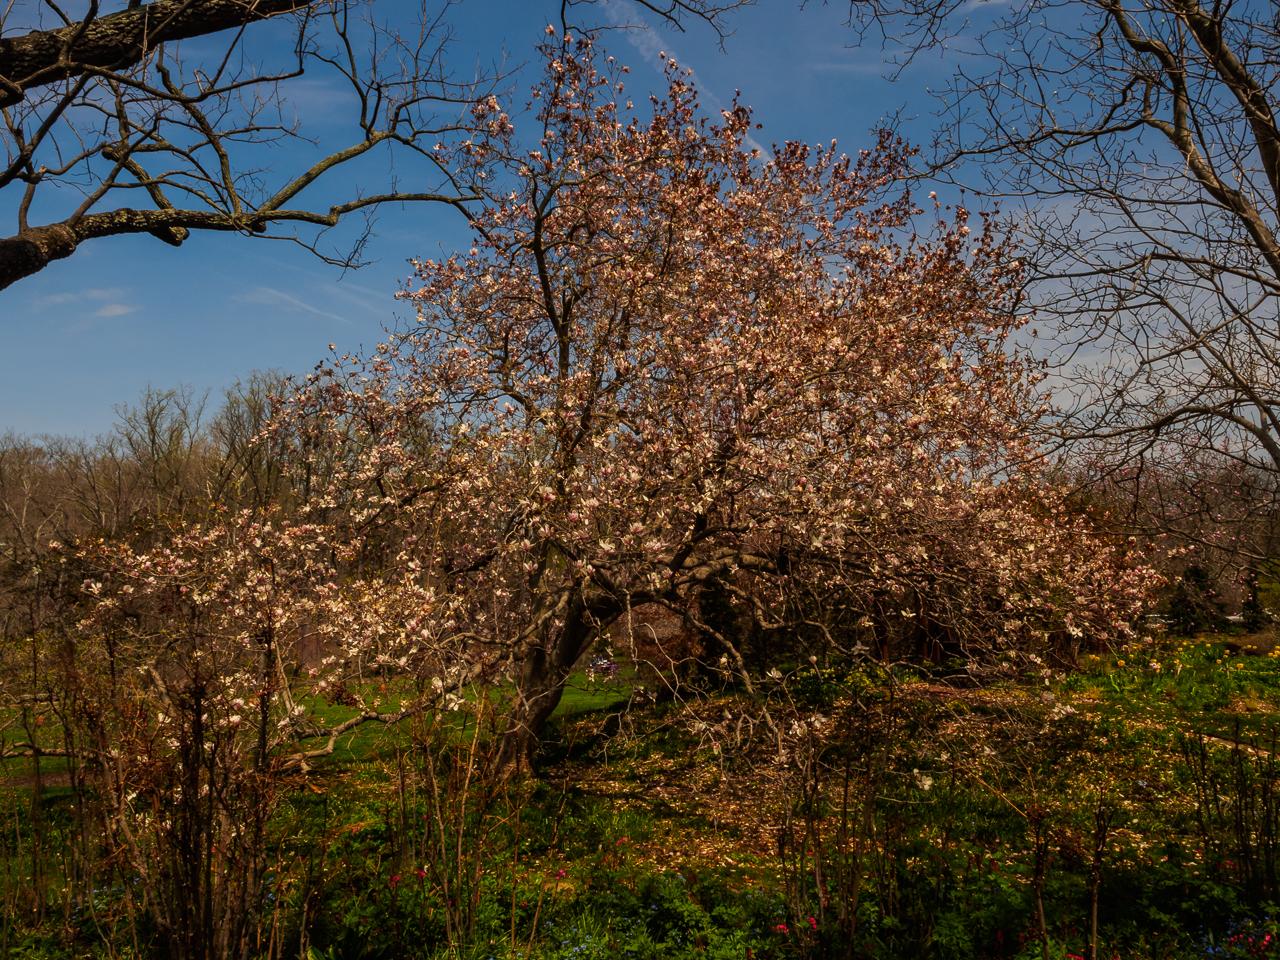 Photograph of a Beautiful tree at Chanticleer-4250022